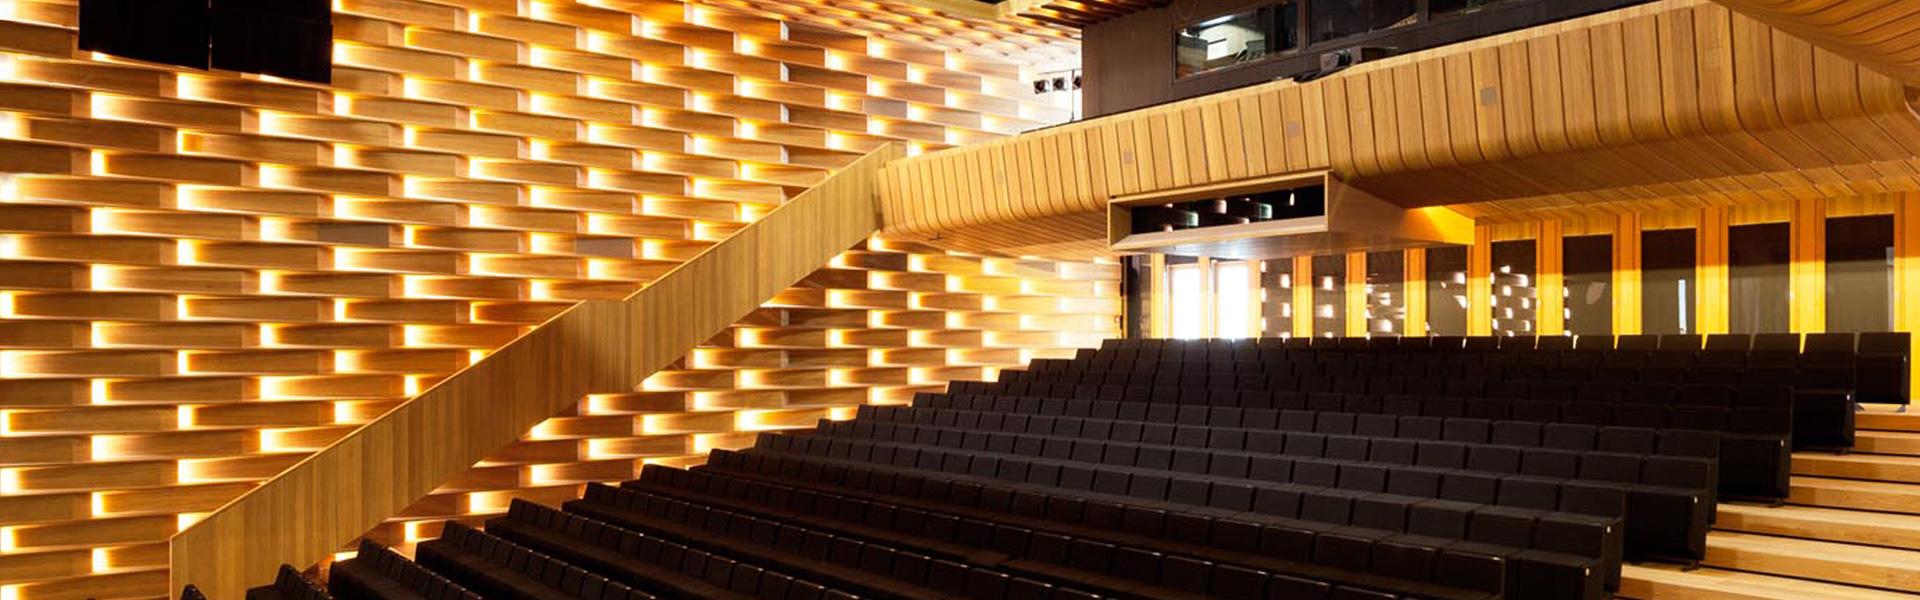 heidelberg-theater